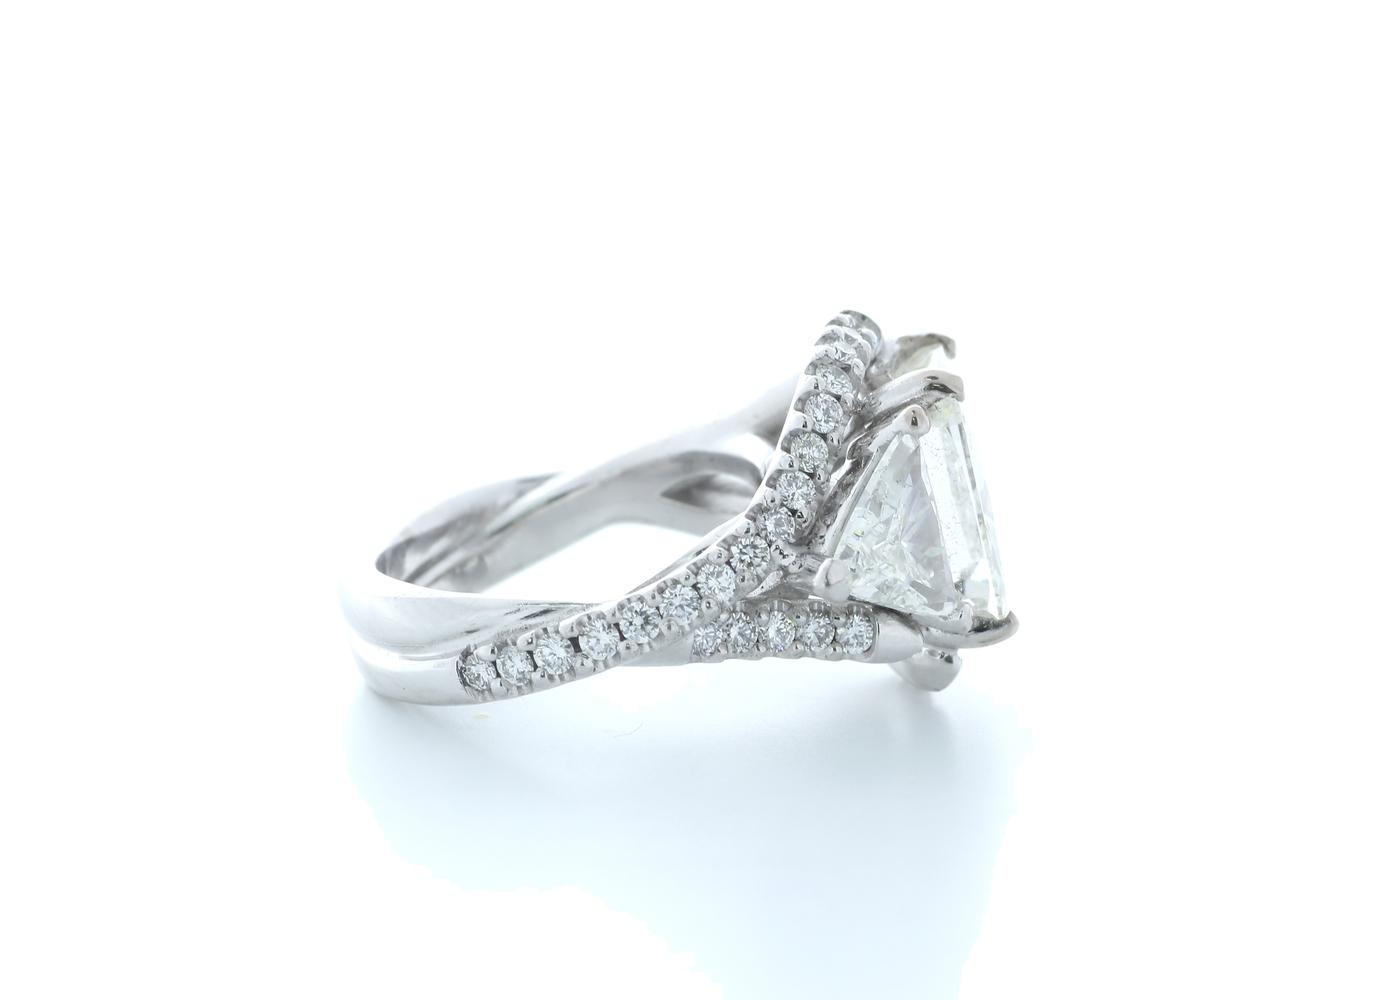 18ct White Gold Cushion Diamond Ring 7.03 (4.51) Carats - Image 4 of 5